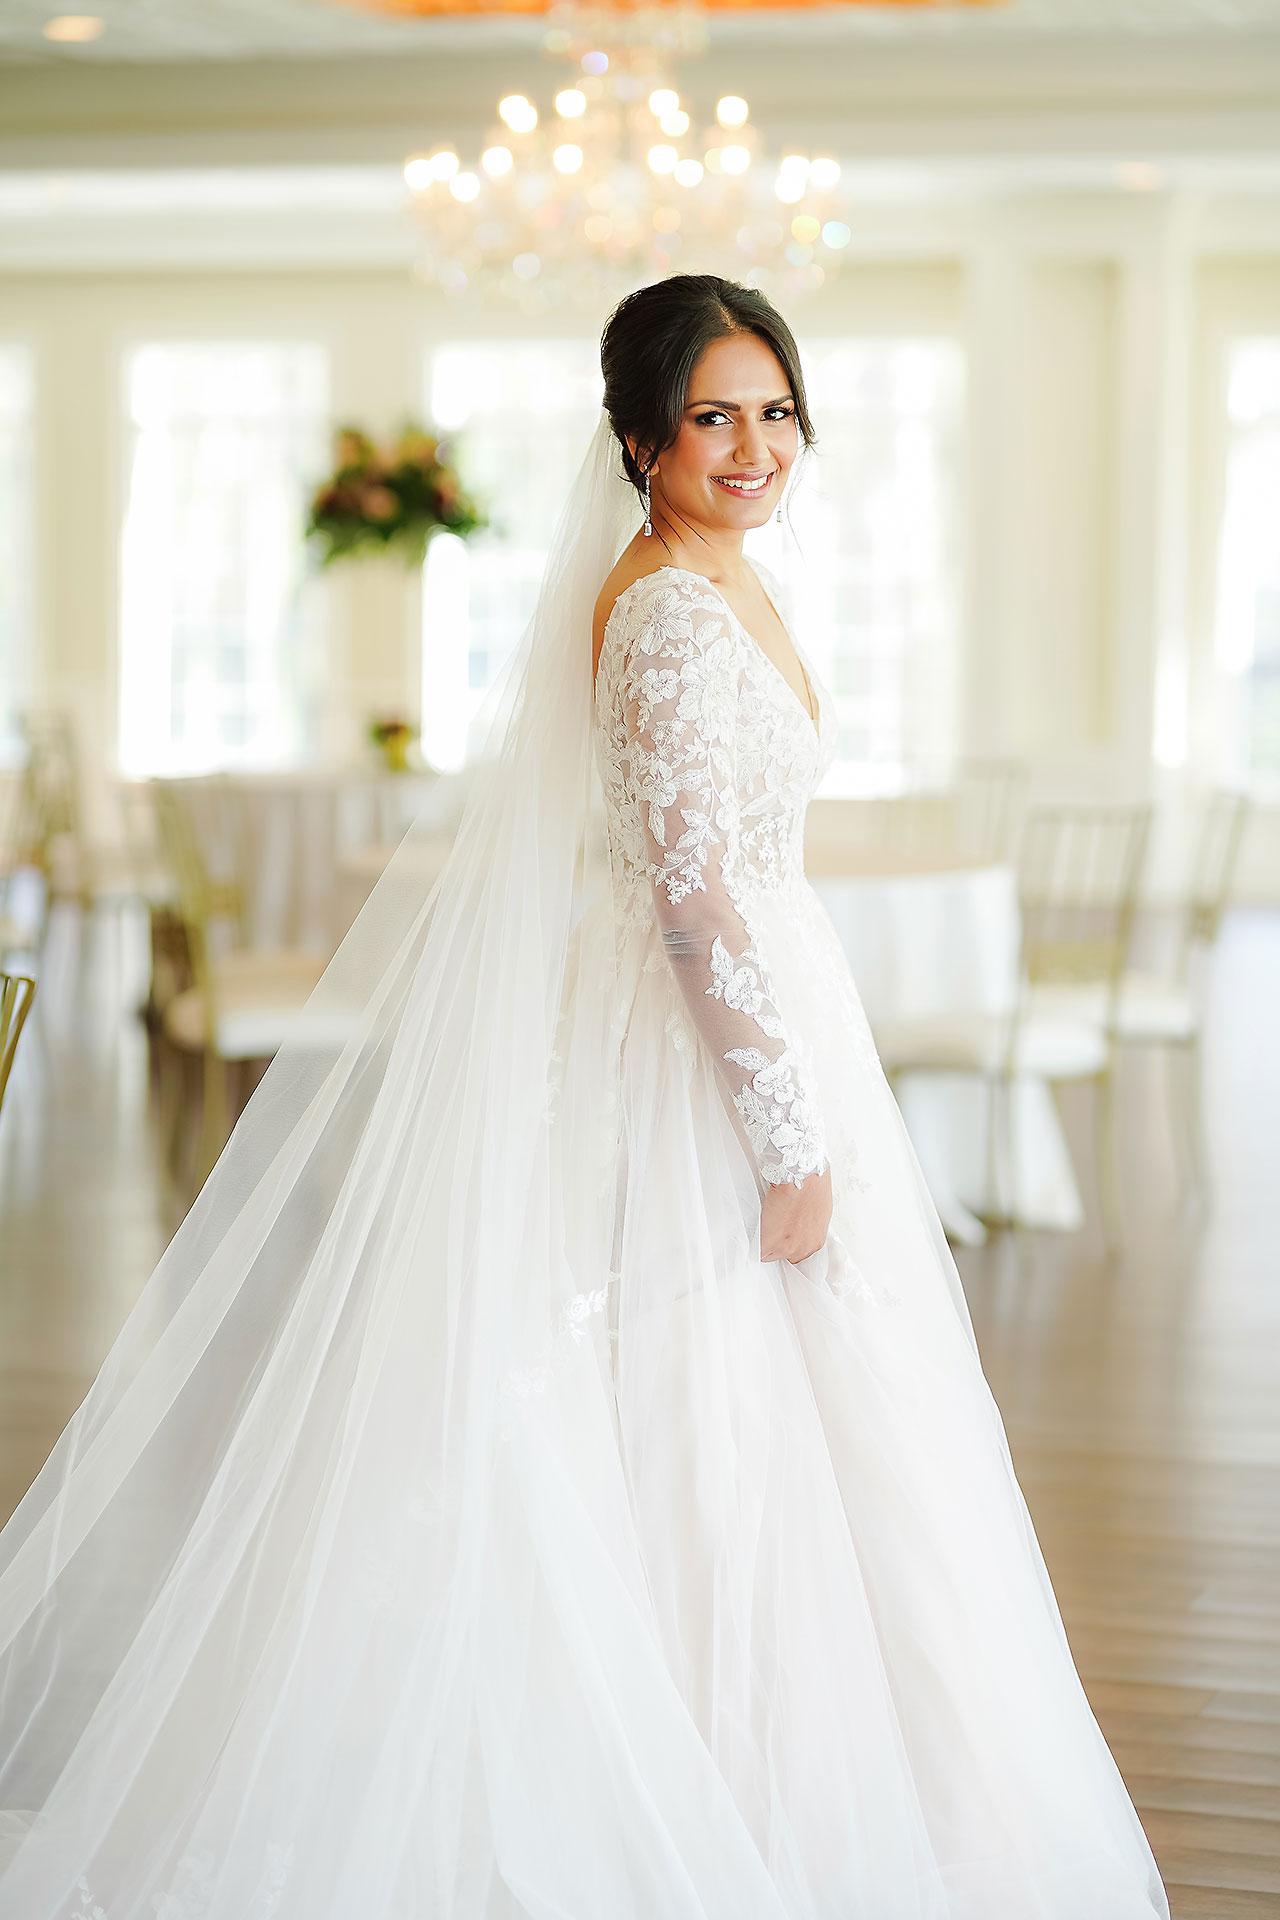 Nadia Parker Black Iris Estate Carmel Indiana Wedding May 2021 045